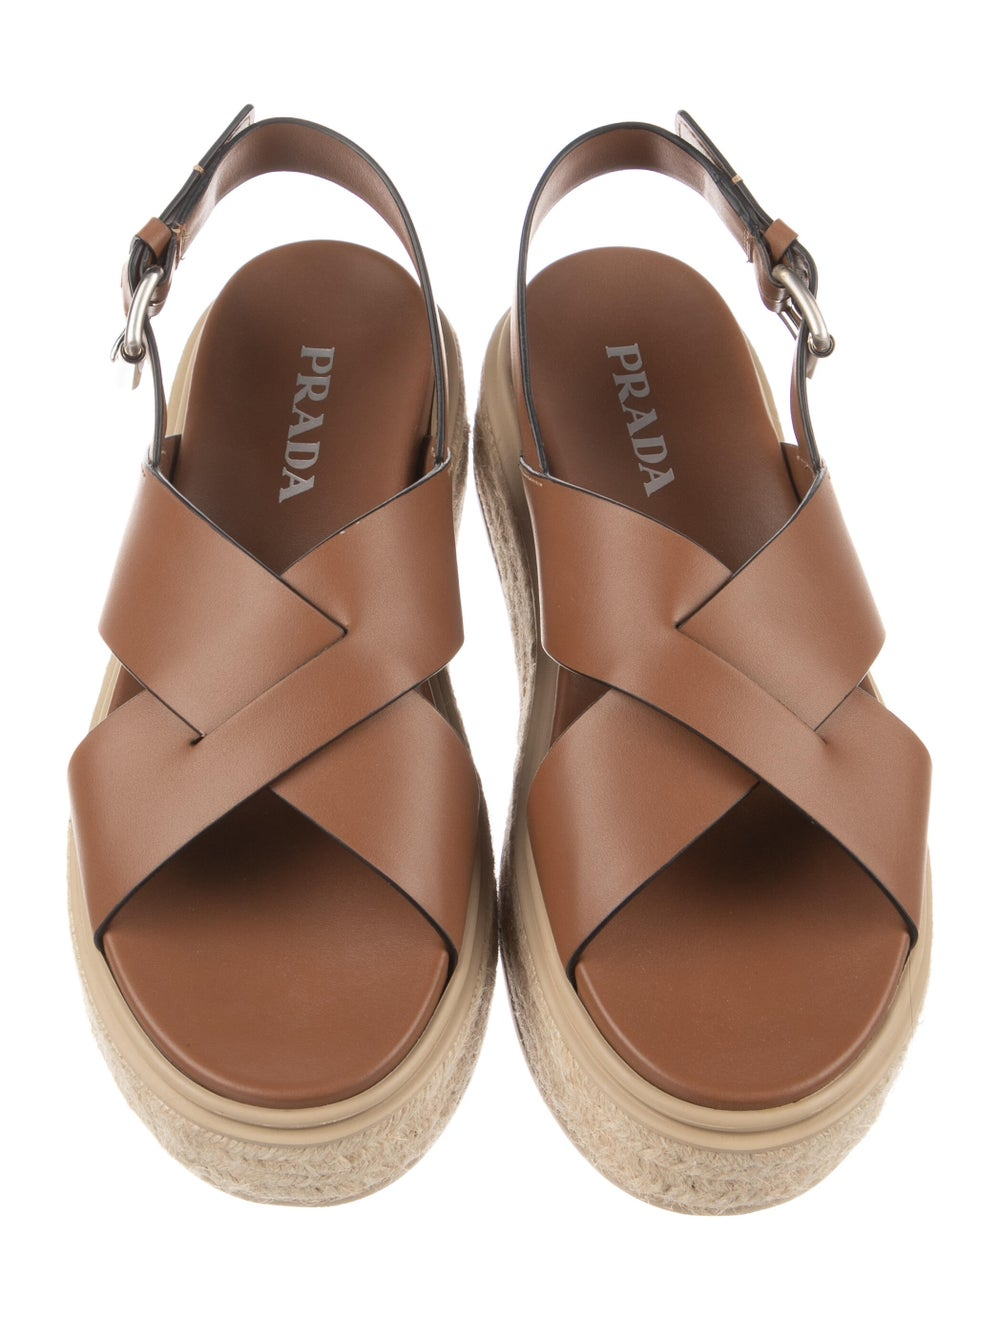 Prada Leather Espadrilles Brown - image 3